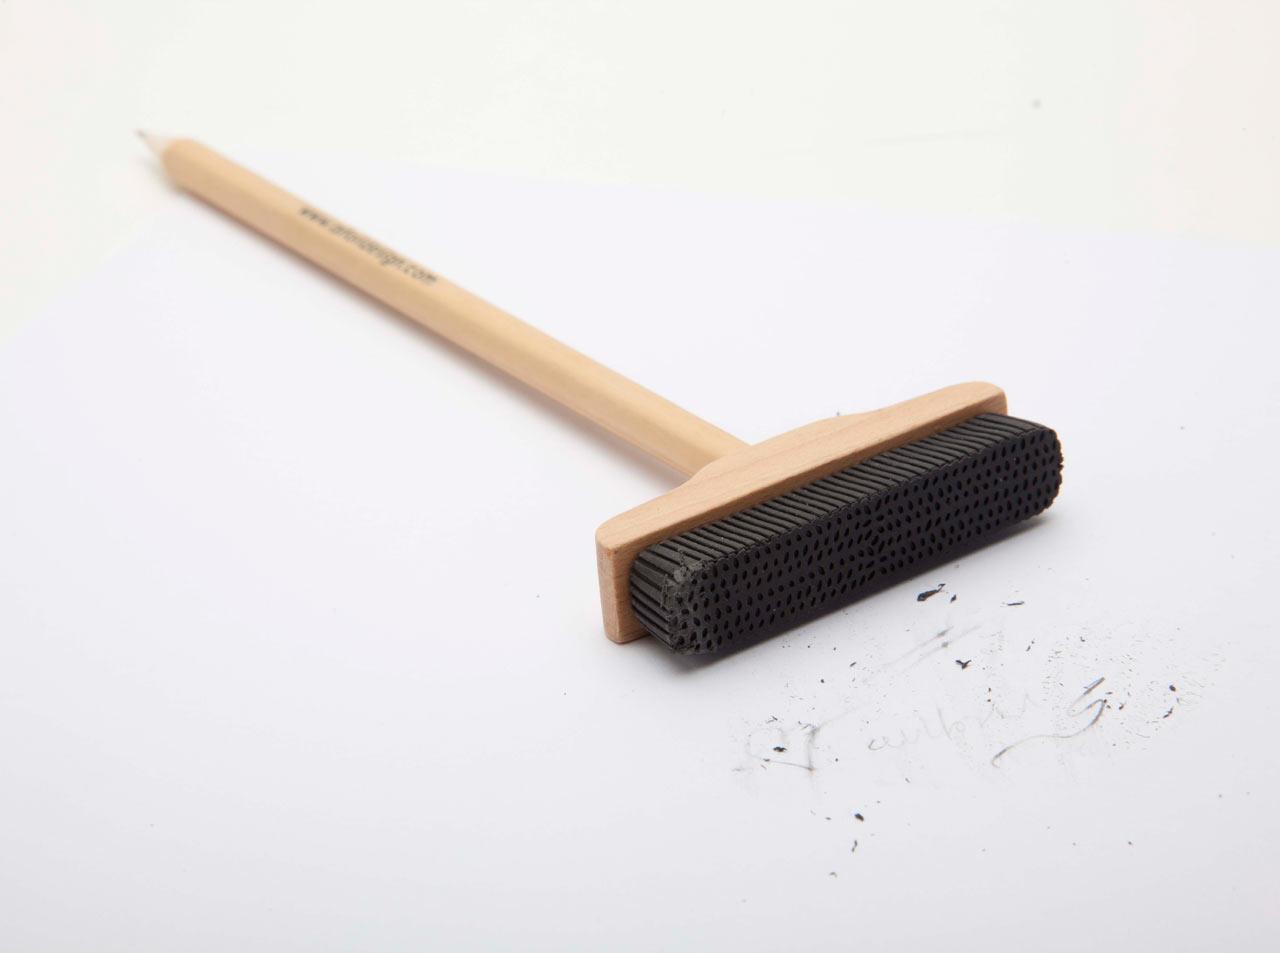 Artori-Design-4-Pencil-Broom